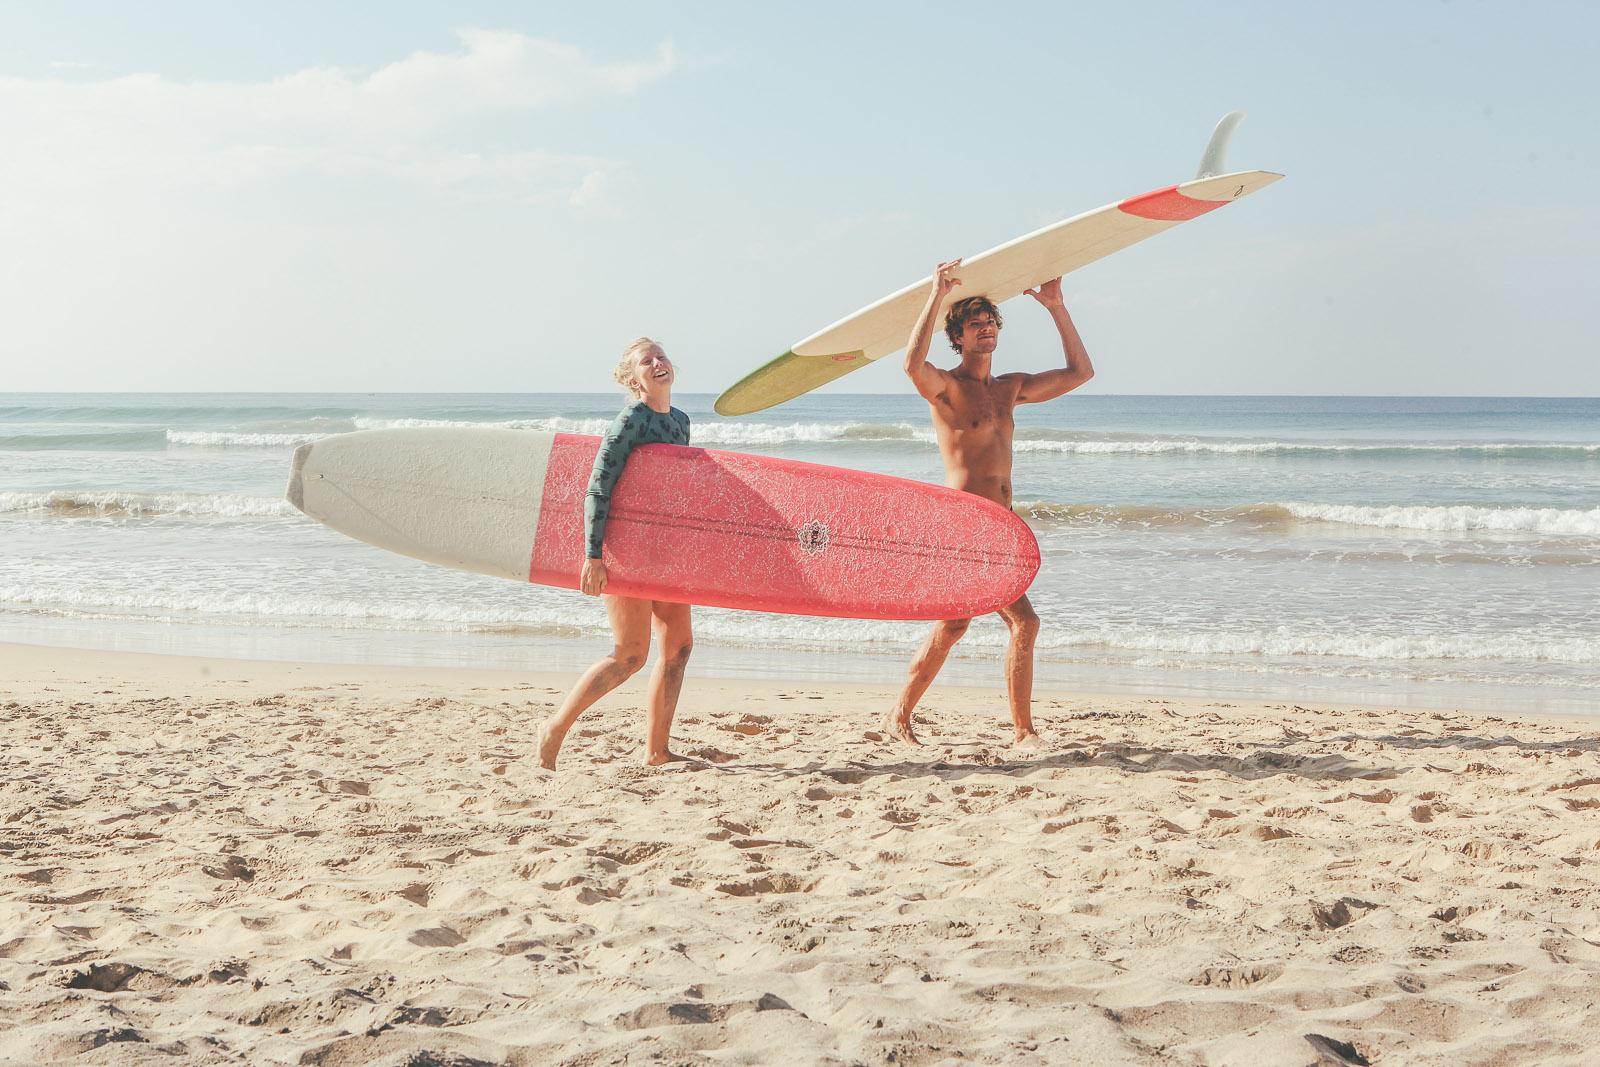 Sunshinestories-Sri-Lanka-Medawatta-Medawata-Meda-Watta-Mada-surf-Lonboard-Surfing-Wave-Surf-School-Camp-Yoga-Studio-IMG_0848